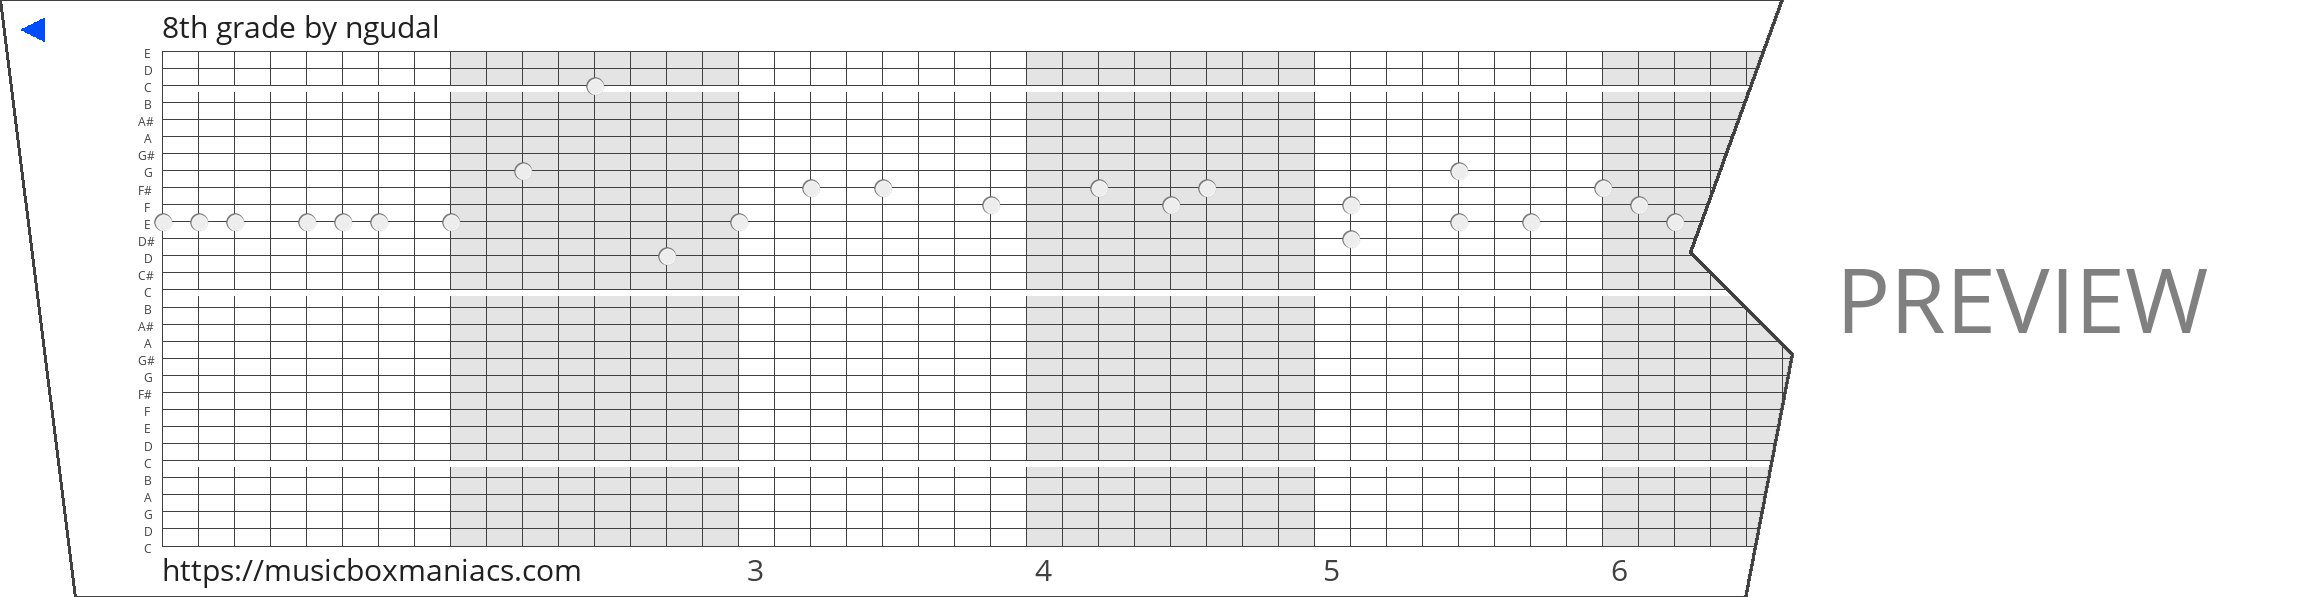 8th grade 30 note music box paper strip